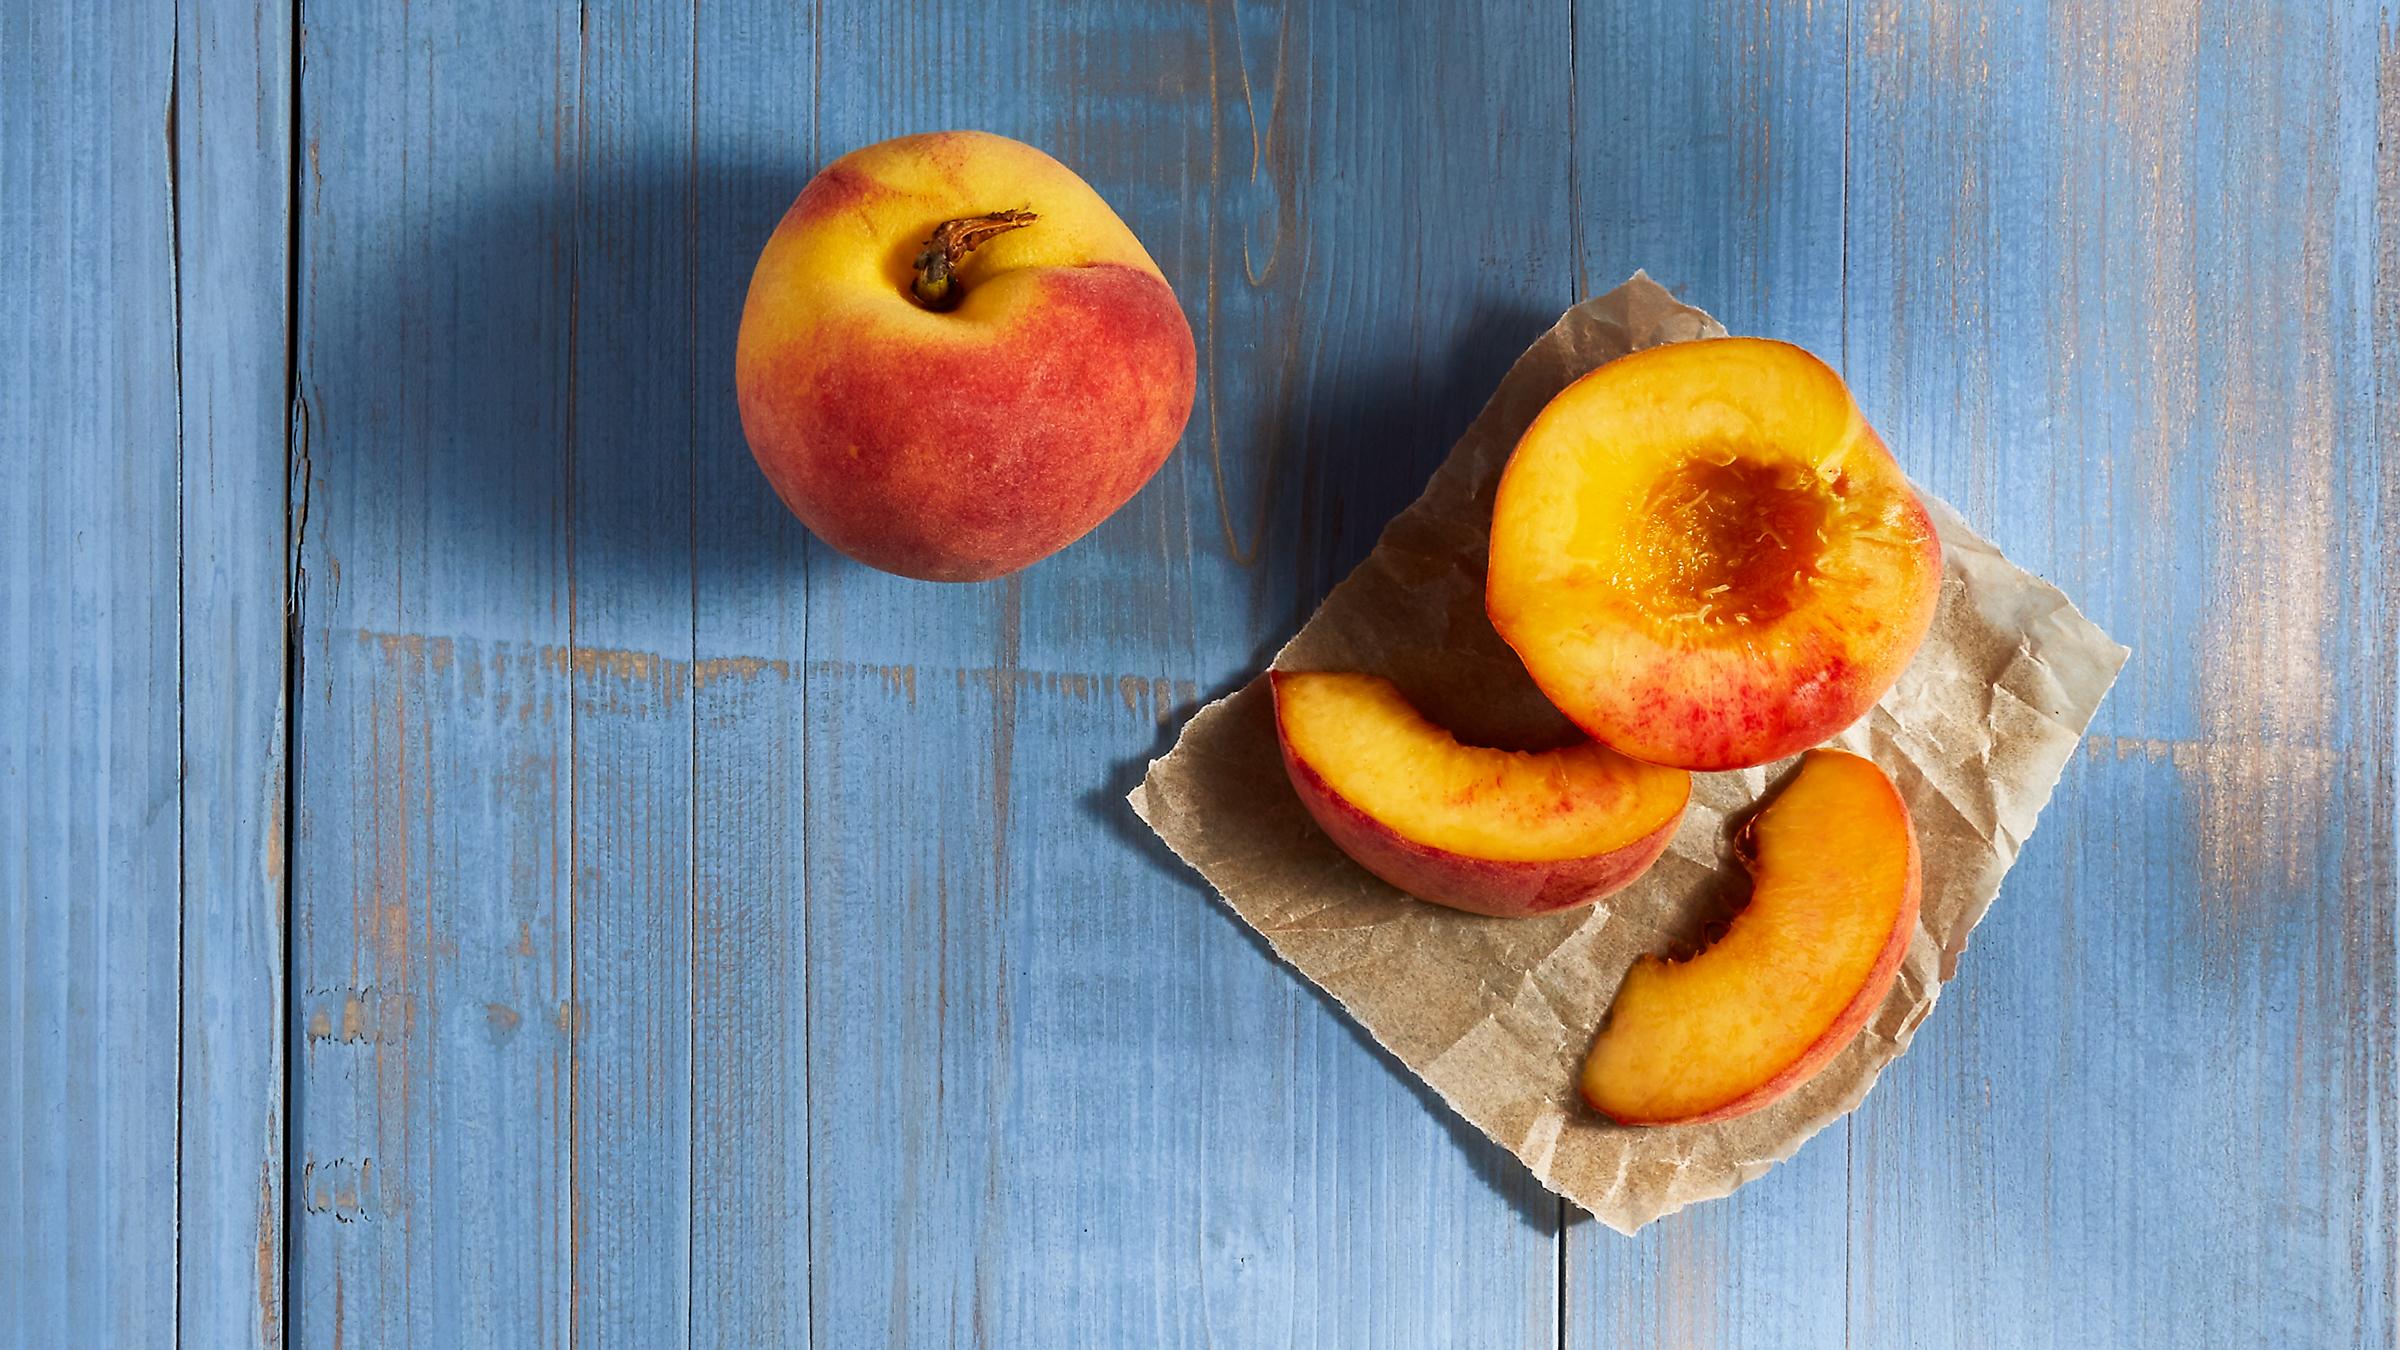 deepi_ahluwalia_walmart_peaches_crop.jpg